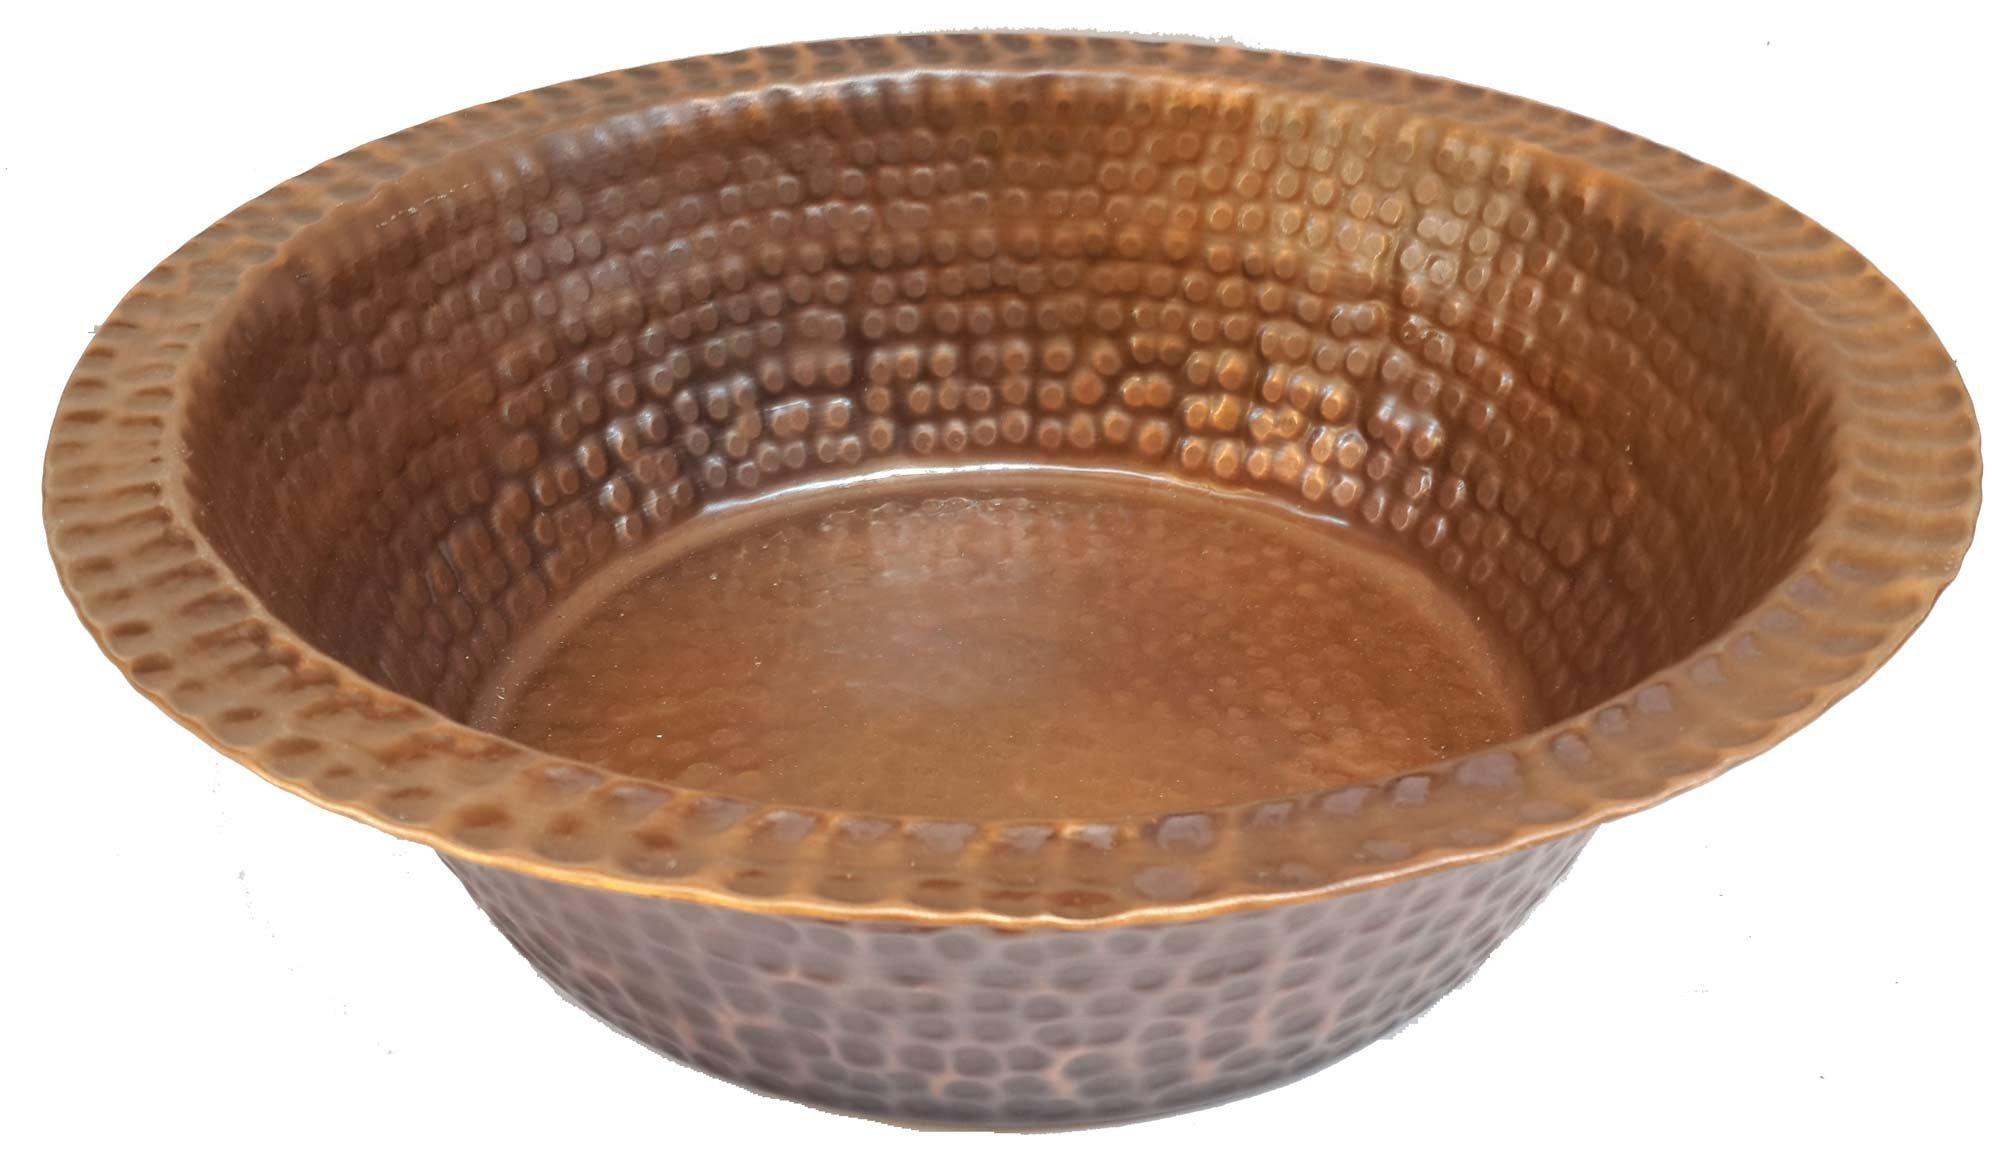 Egypt gift shops Antique Patina Foot Massage Bath Bucket Pedicure Spa Styling Salon Pedicure Bowl